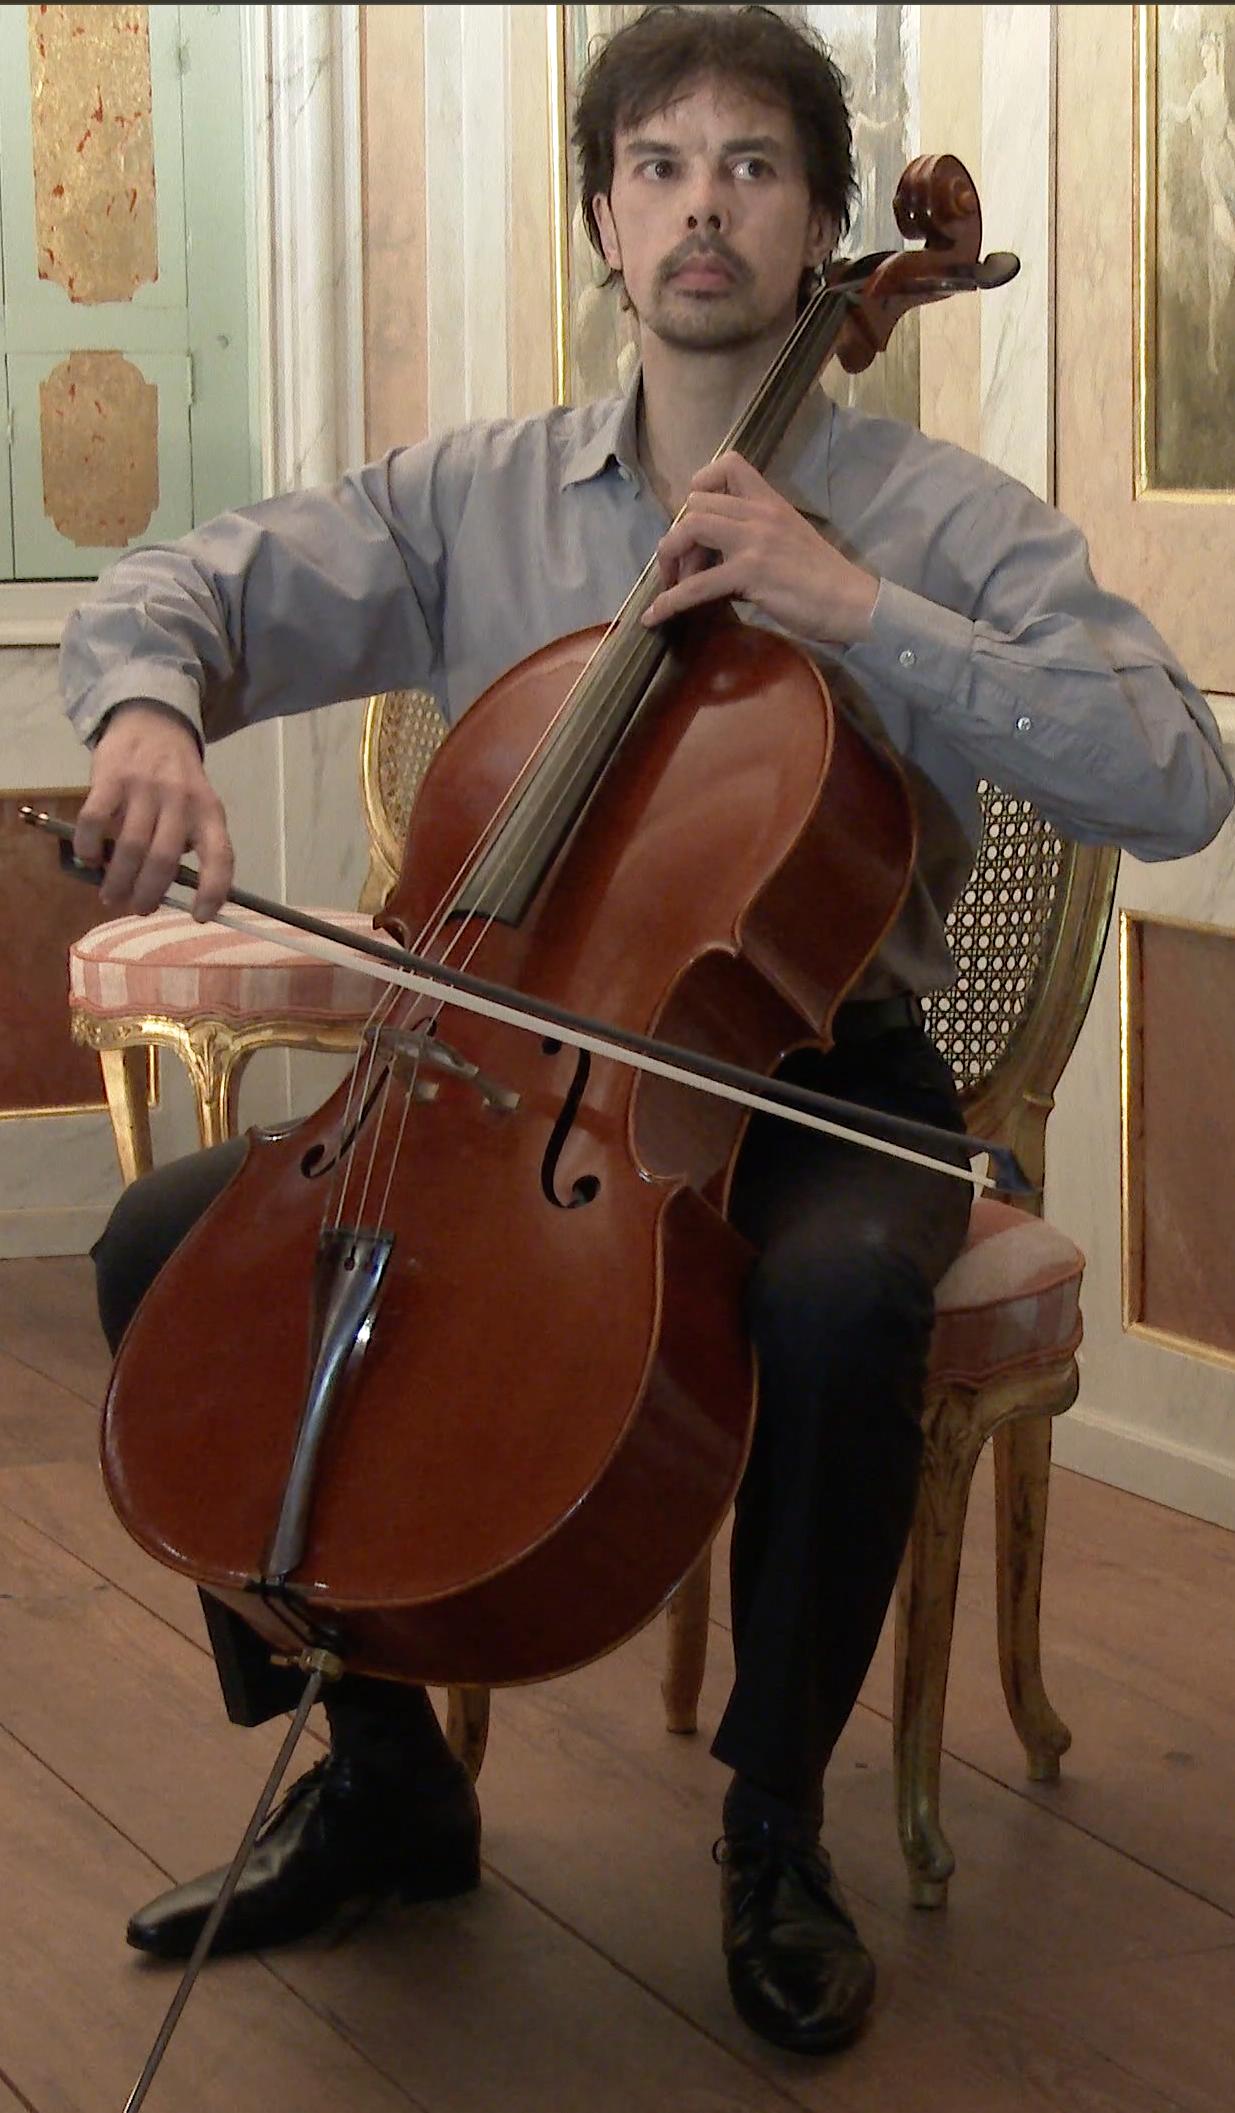 Detmar-Leertouwer-detmarleertouwer.com-Dominus-Maris-Music-Productions-Bach-in-Castles-Bach-in-Burchten-Misha-Maisky-Pieter-Wispelwey-Book-for-Cello-Peteris-Vasks-Peter-Sculthorpe-Requiem-for-Cello-Alone-Fantasia-for-Cello-Alone-Richard-Gwilt-Cello-Cellist-Violoncello-Yo-Yo-Ma